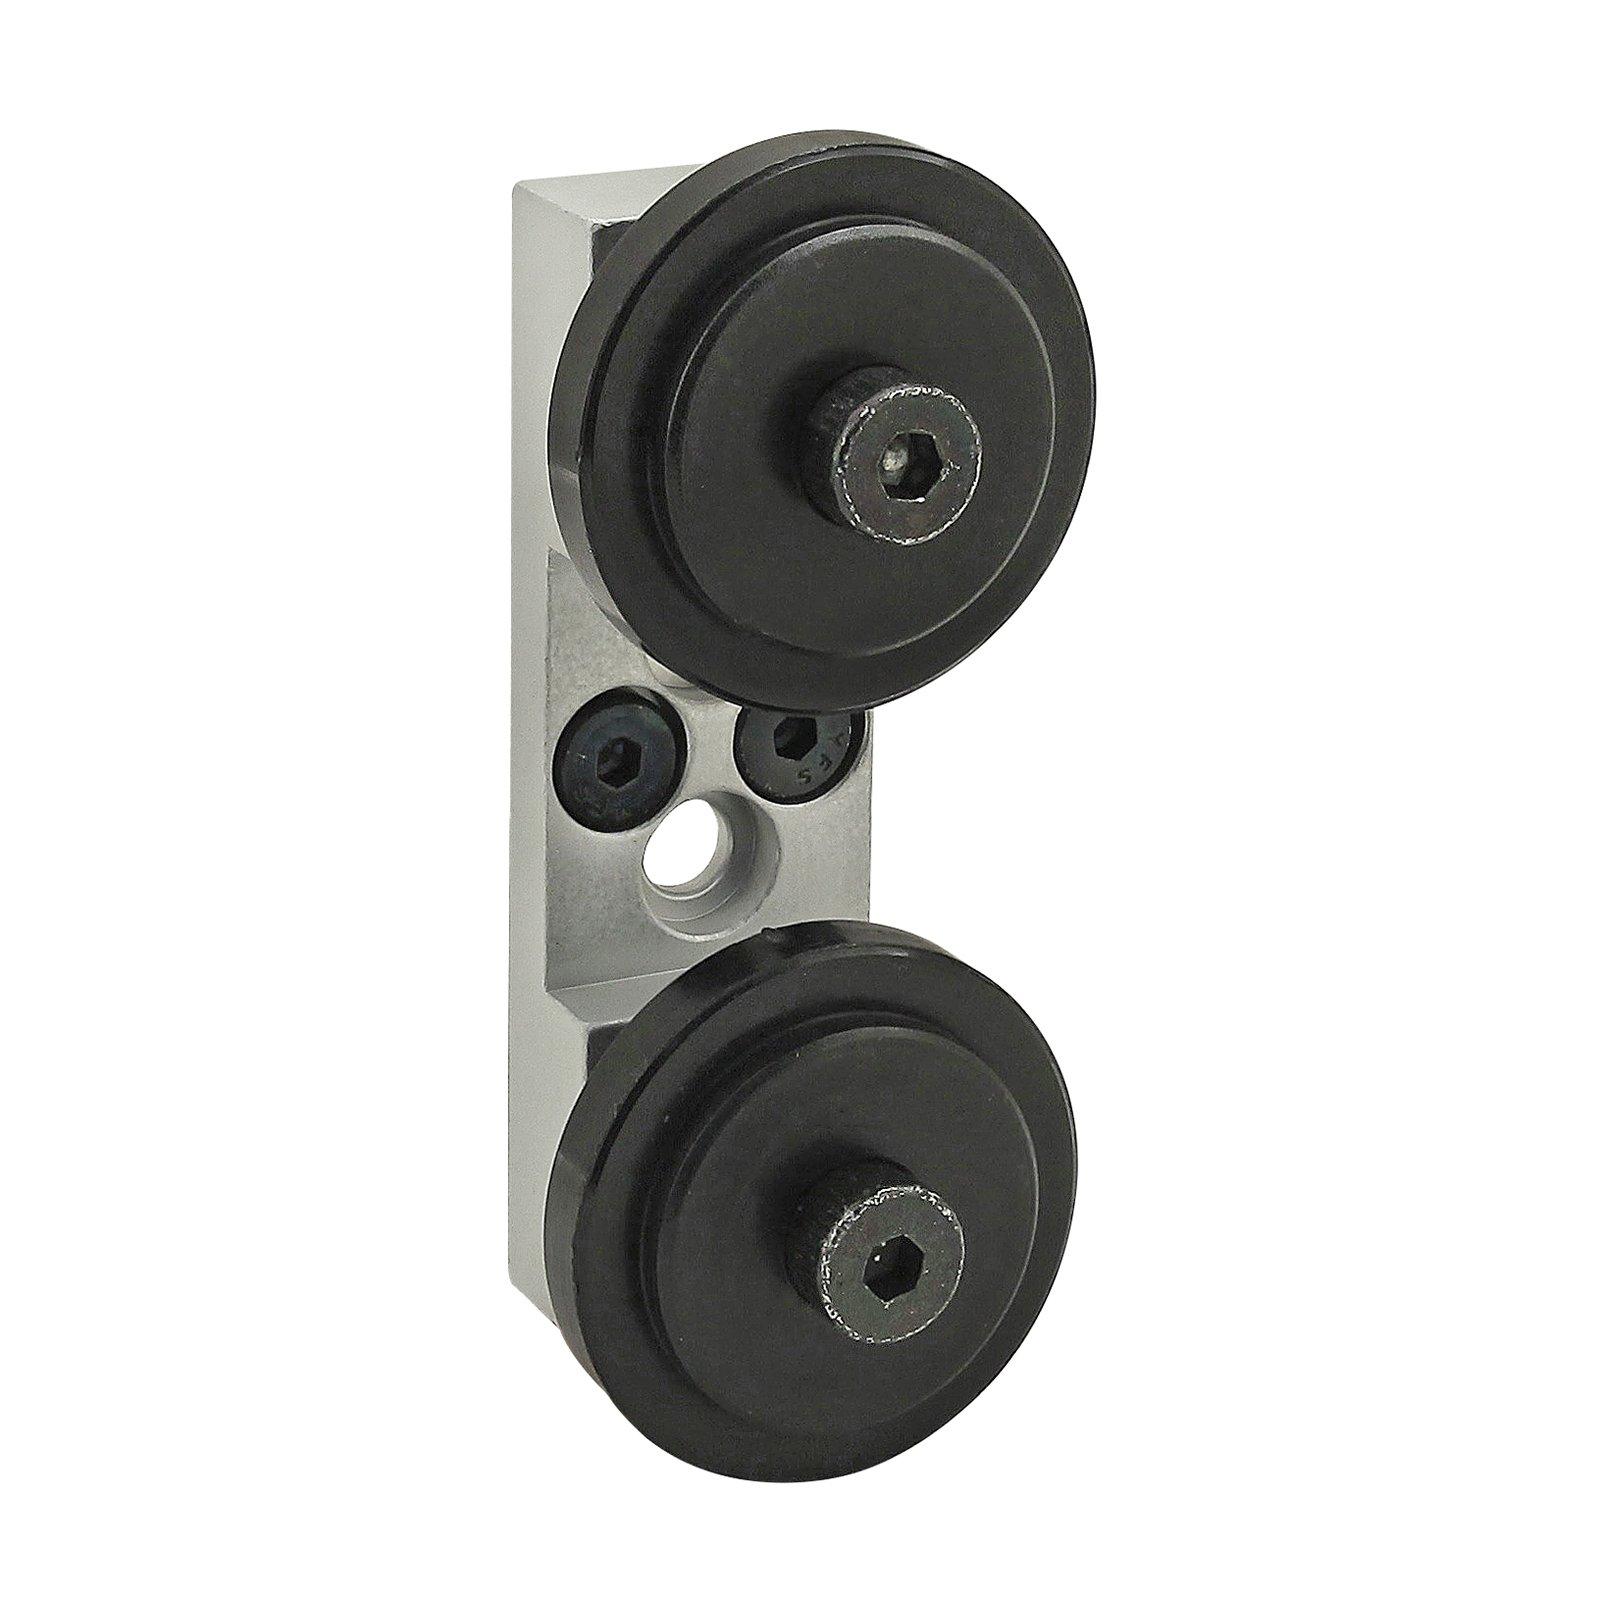 80/20 Inc., 2751, 10 Series, Roller Wheel Bracket Assembly